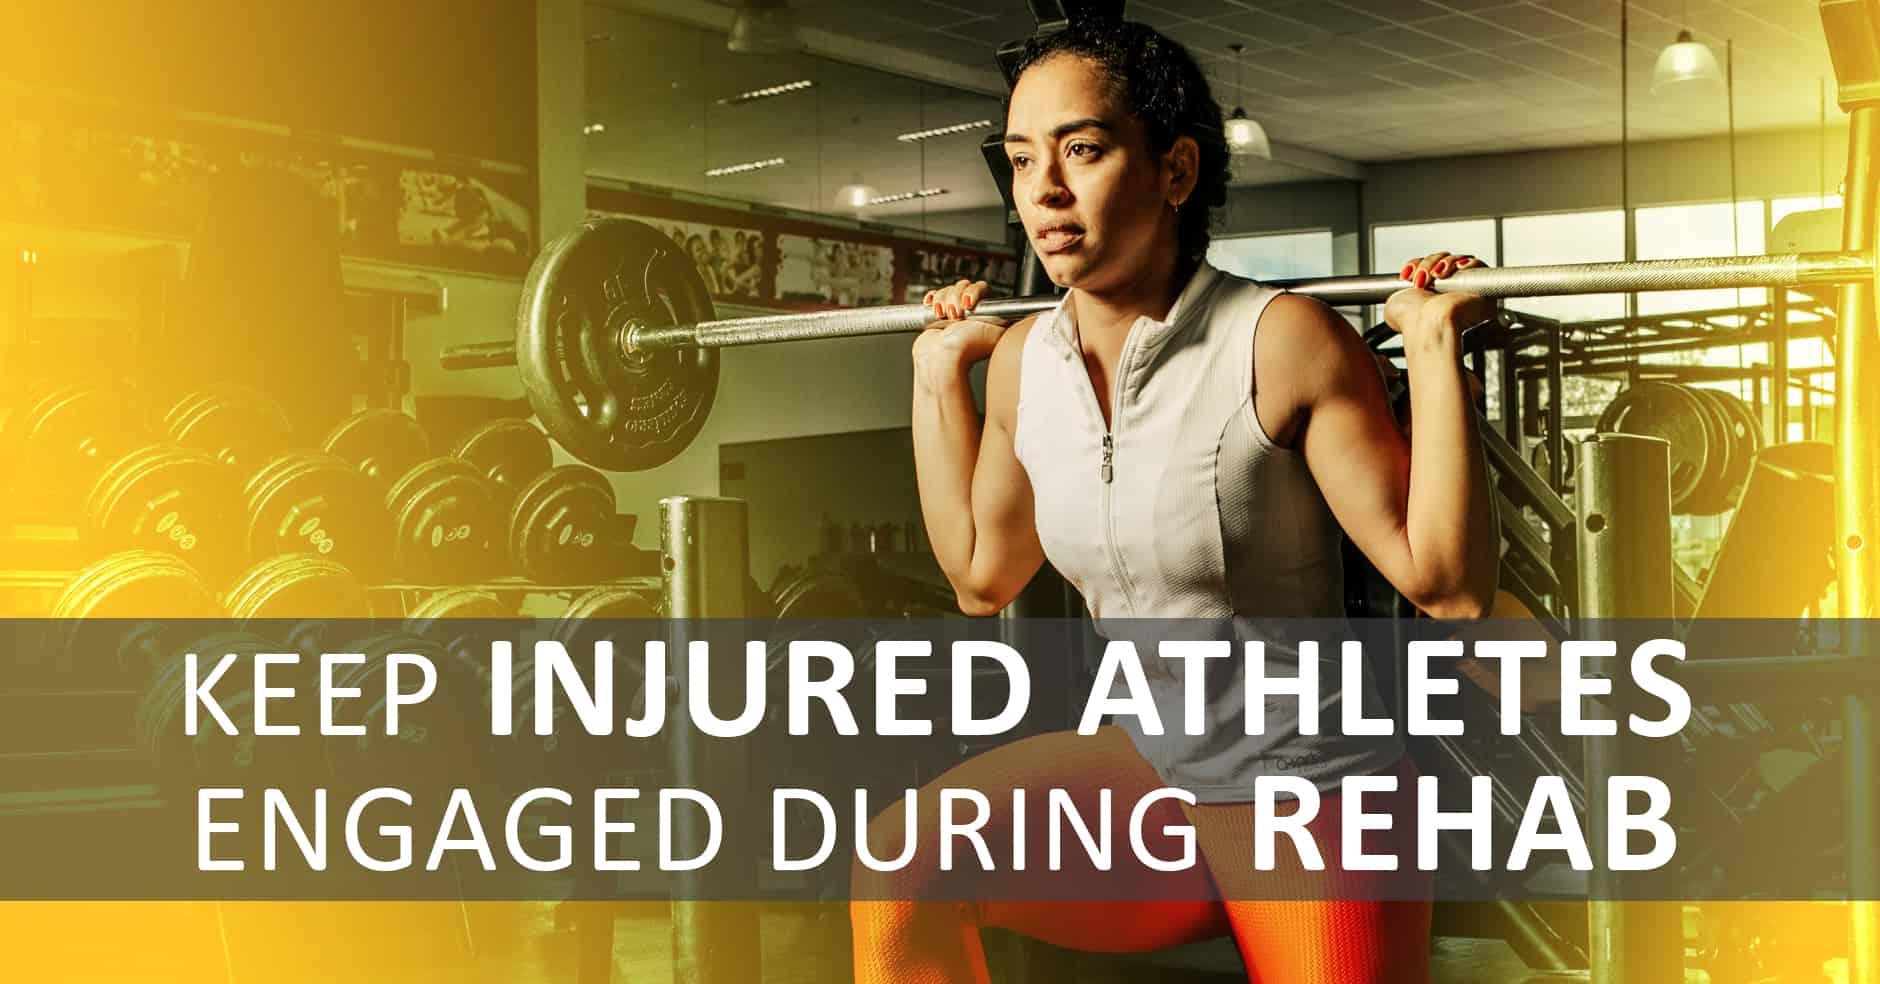 Keep Injured Athletes Engaged During Rehab